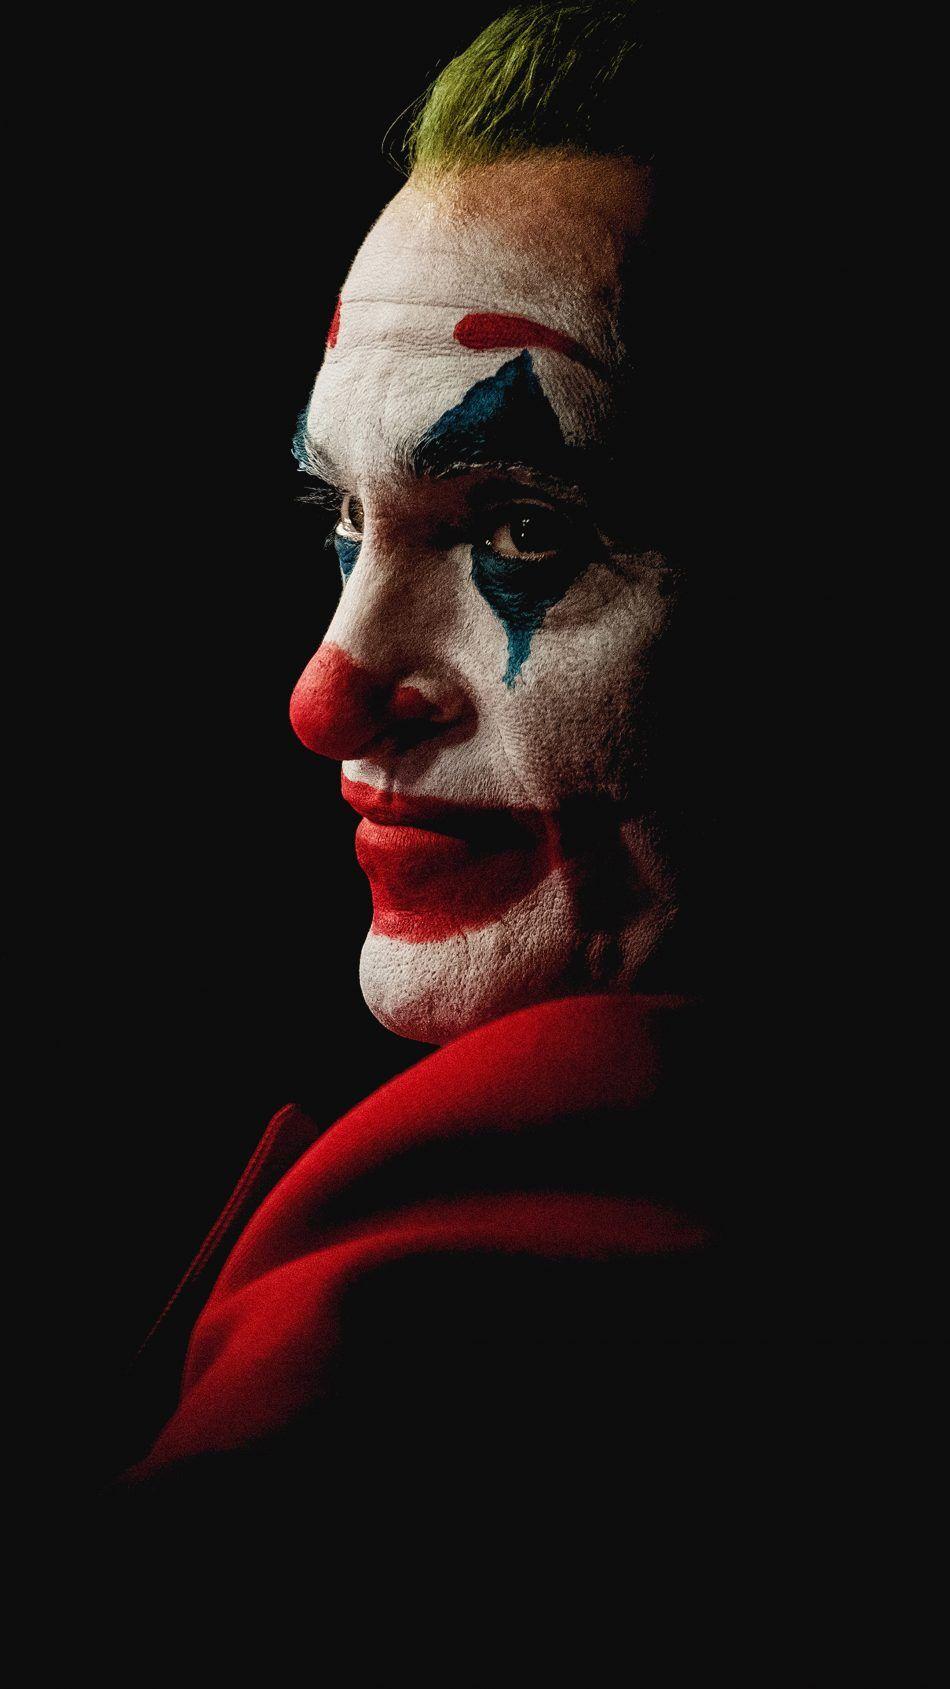 Joaquin Phoenix Joker Black Background 4k Ultra Hd Mobile Wallpaper Joker Hd Wallpaper Joker Poster Joker Images